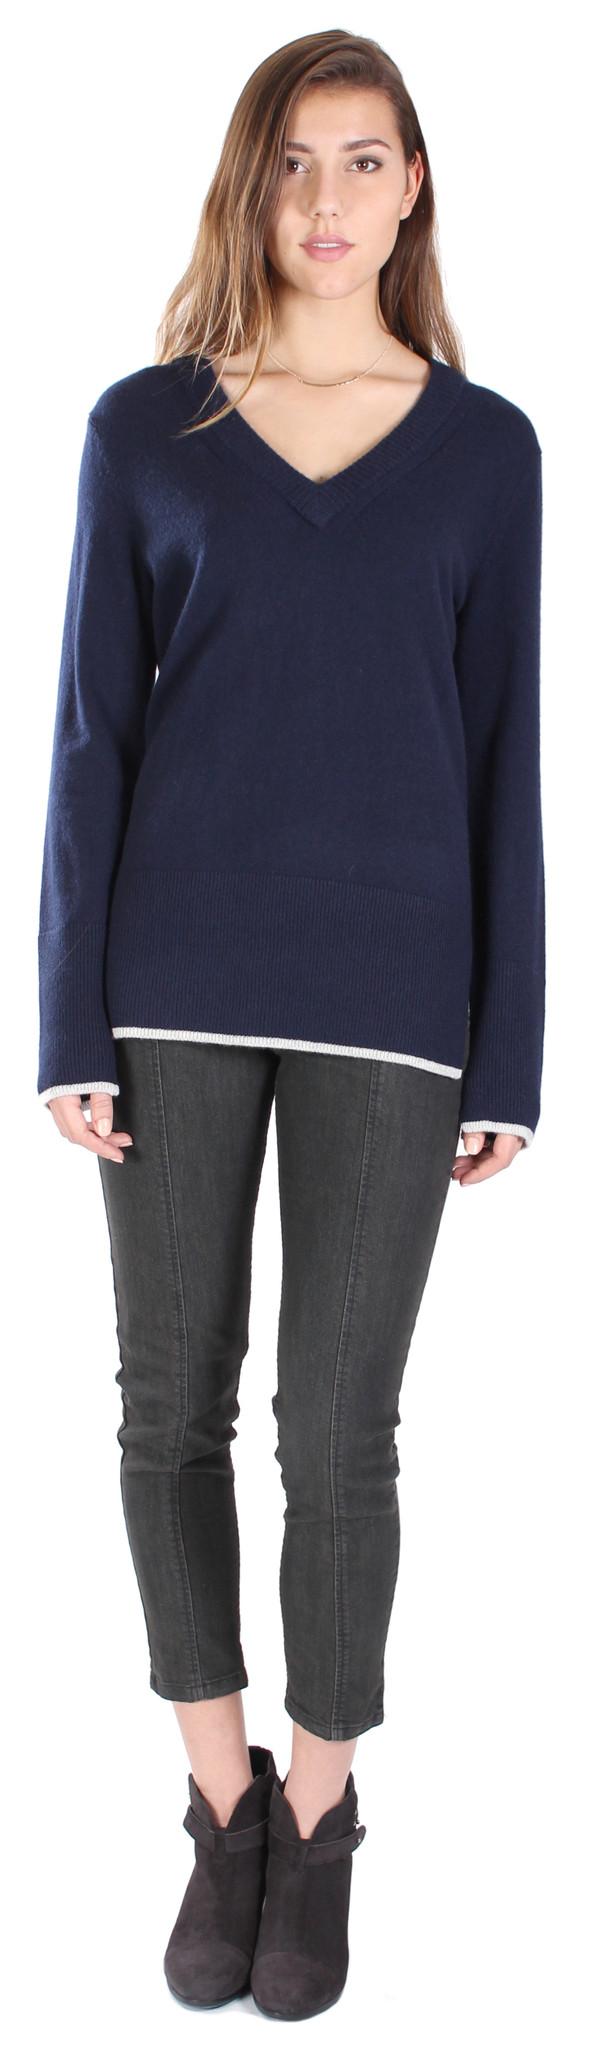 Rag & Bone Flavia V Neck Cashmere Sweater